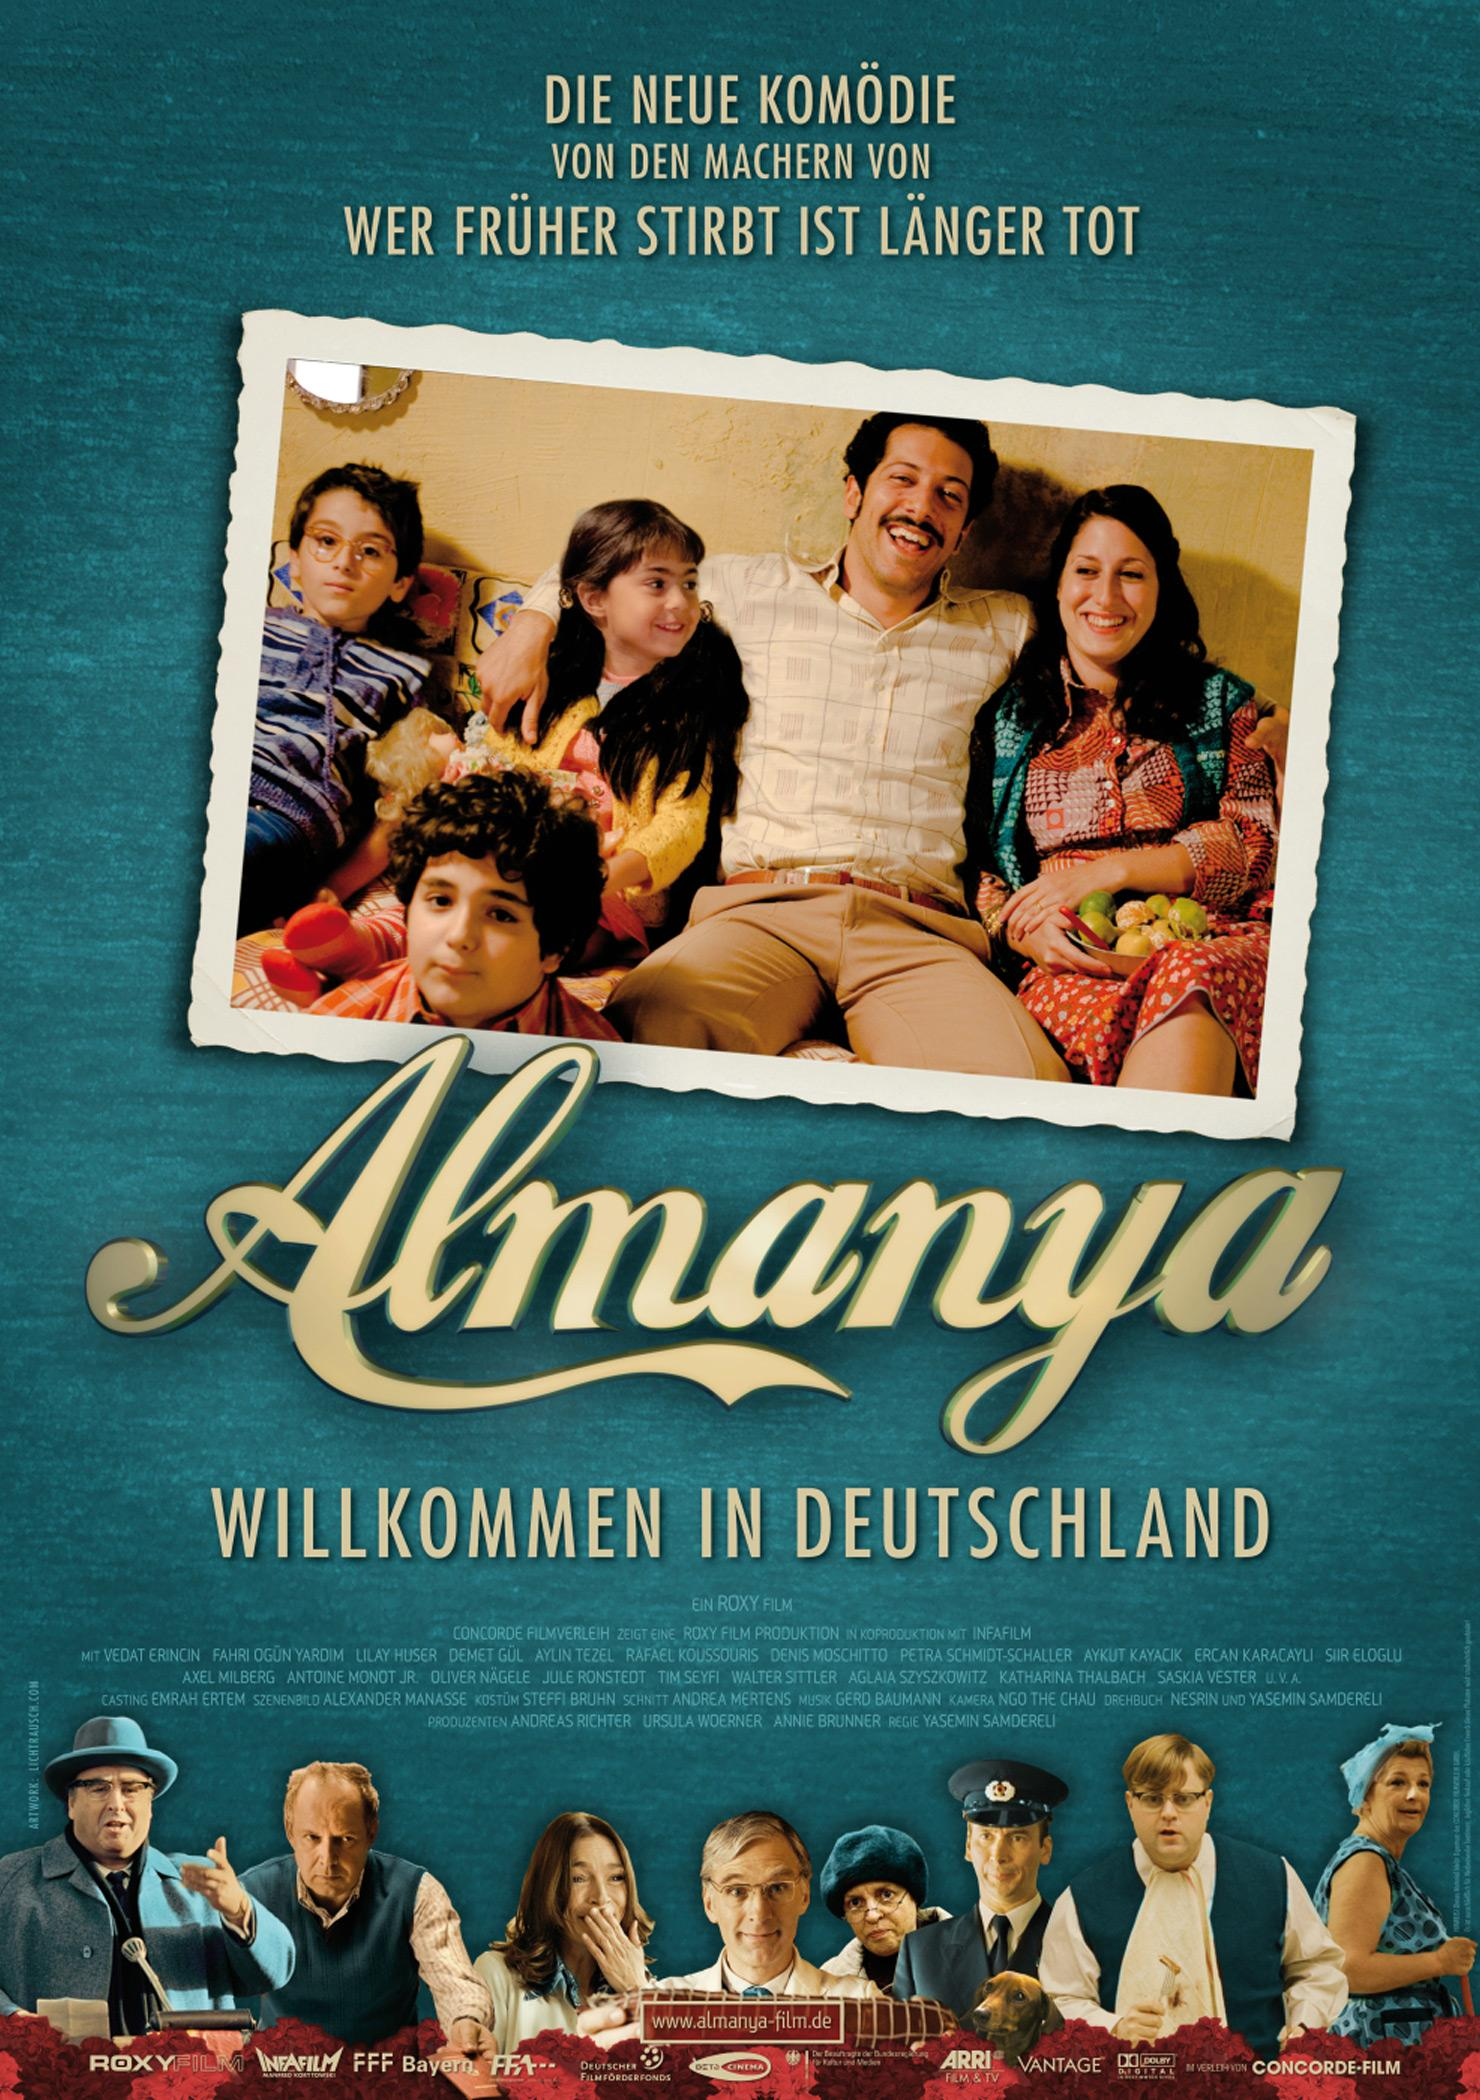 Almanya - Willkommen in Deutschland (Poster)